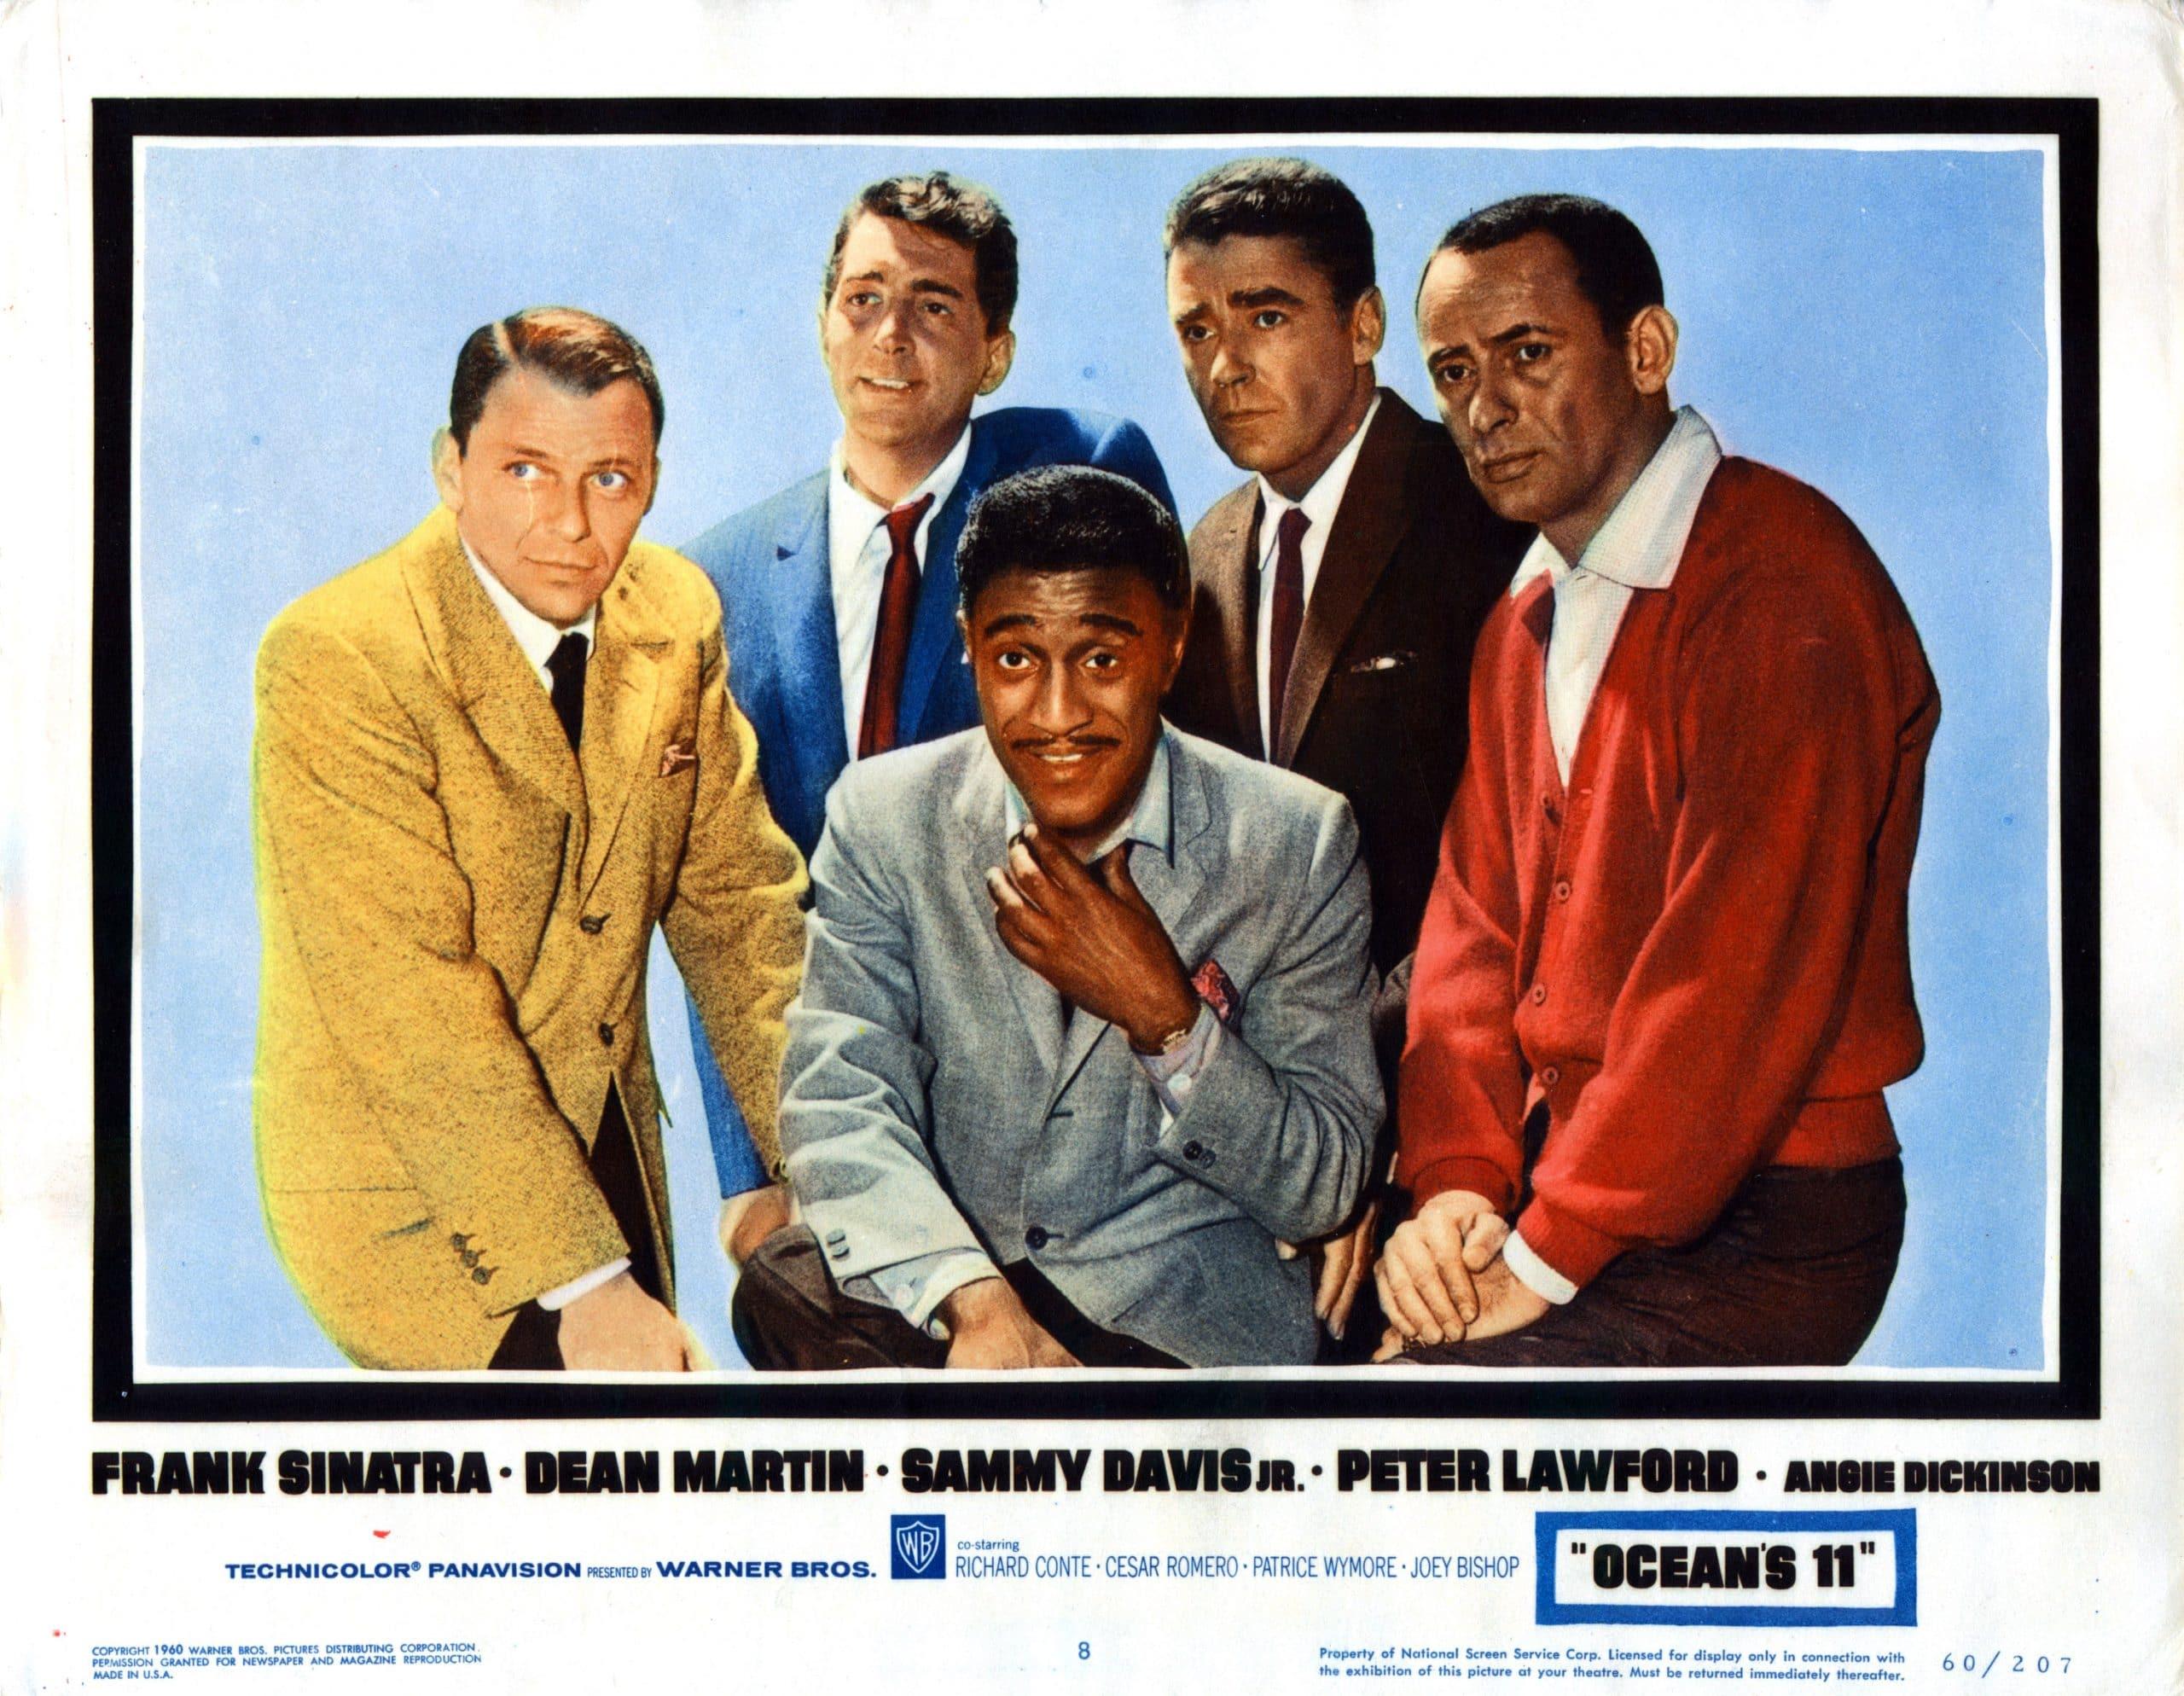 OCEAN'S ELEVEN, (aka OCEAN'S 11), from left, Frank Sinatra, Sammy Davis, Jr., Dean Martin, Peter Lawford, Joey Bishop, 1960